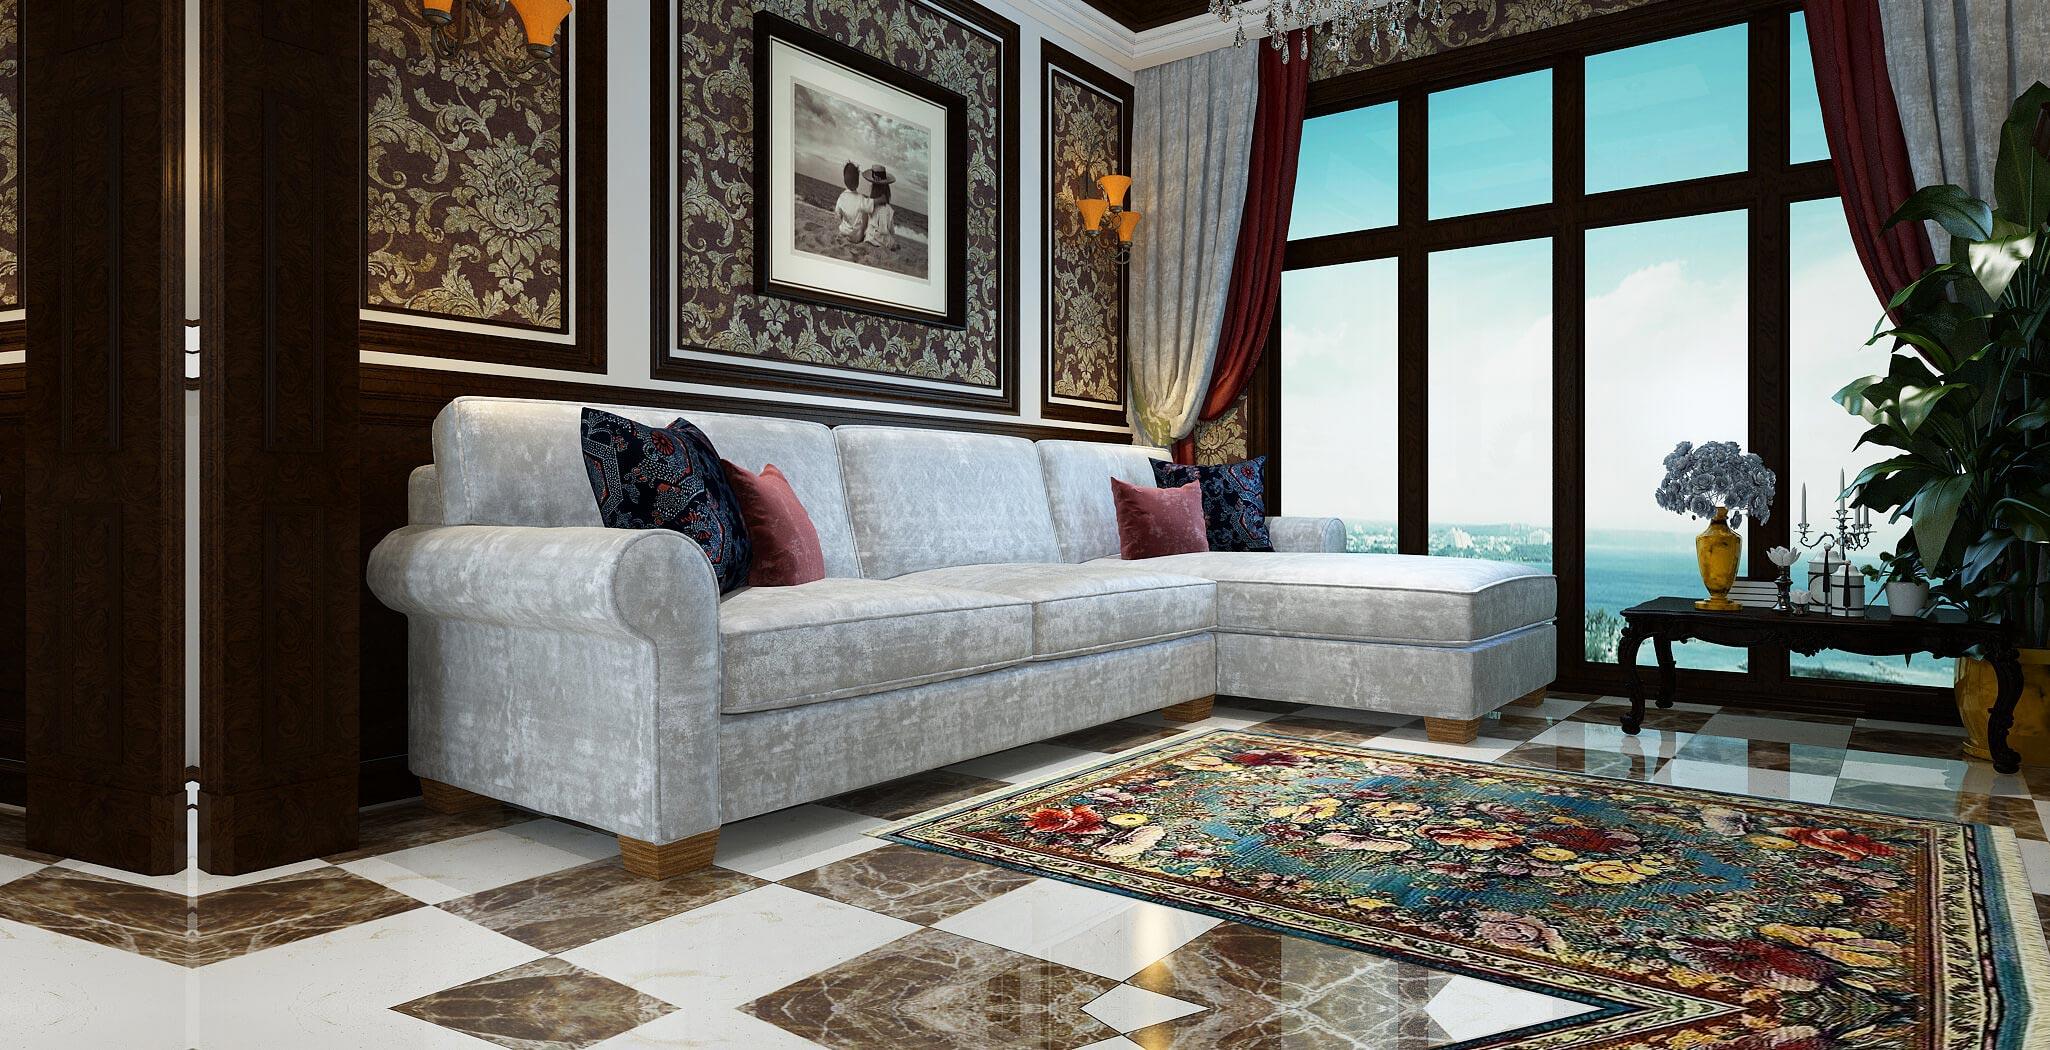 isabel panel furniture gallery 4